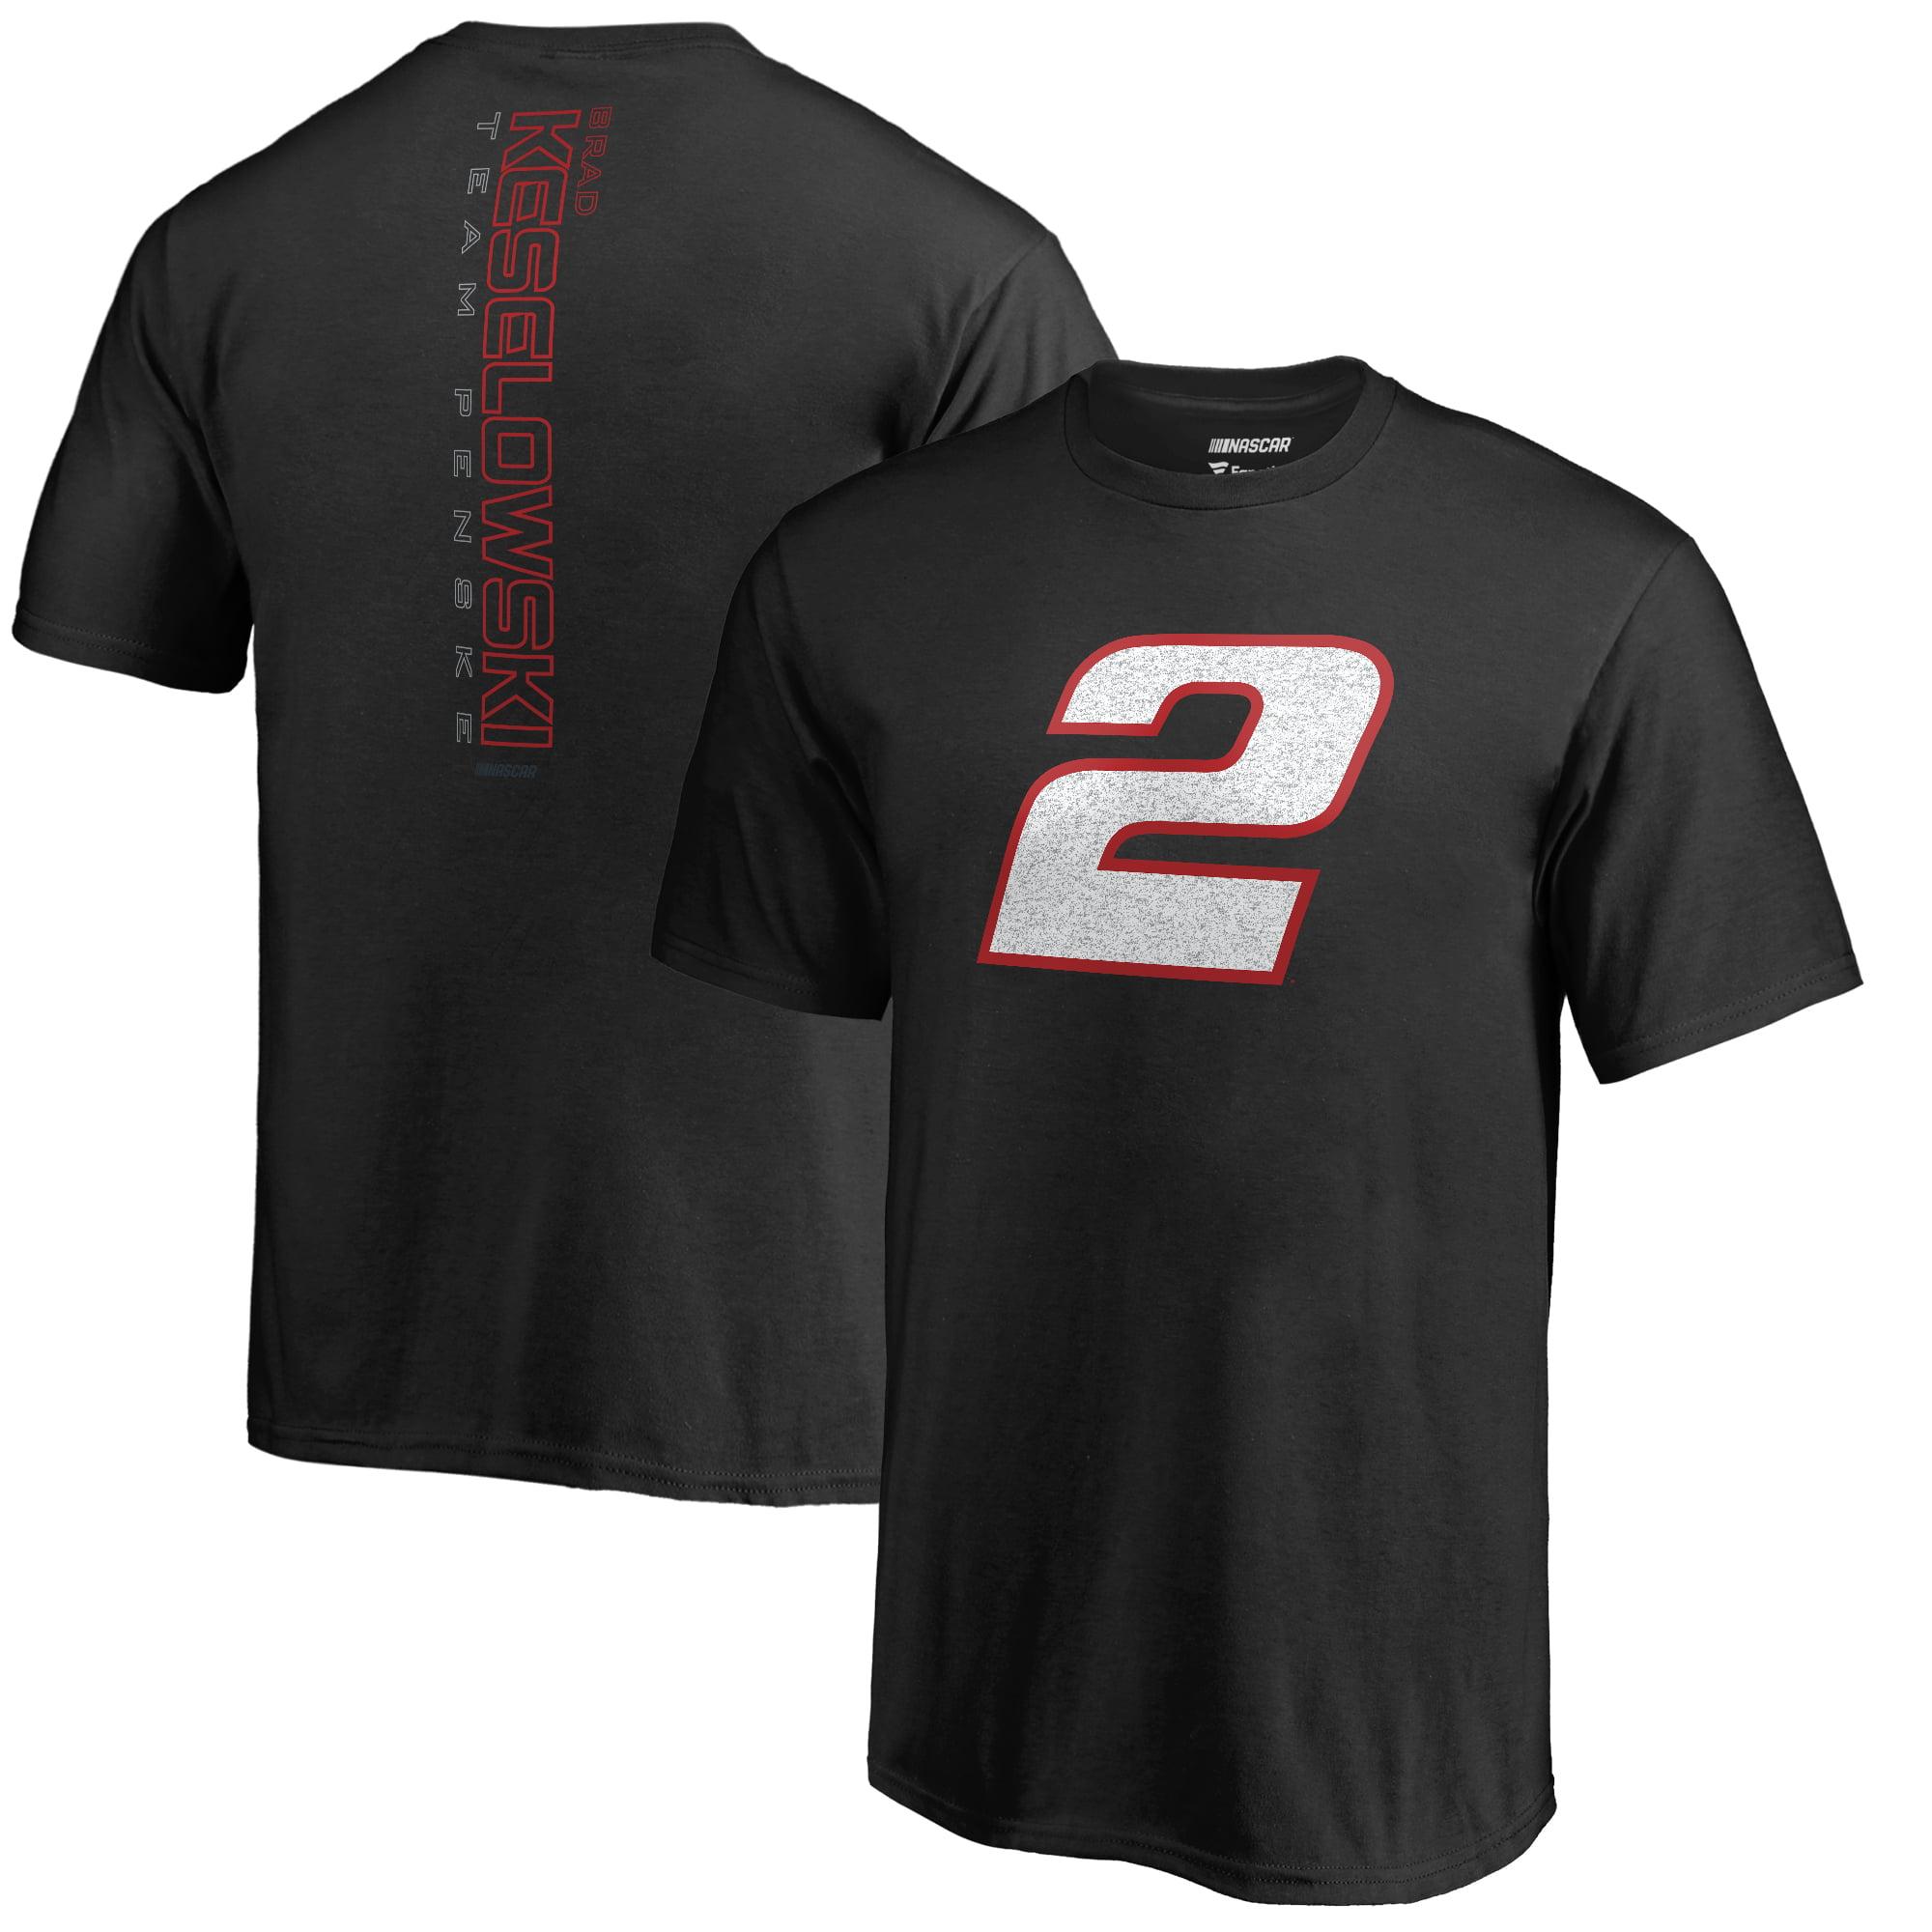 Brad Keselowski Fanatics Branded Youth Static T-Shirt - Black